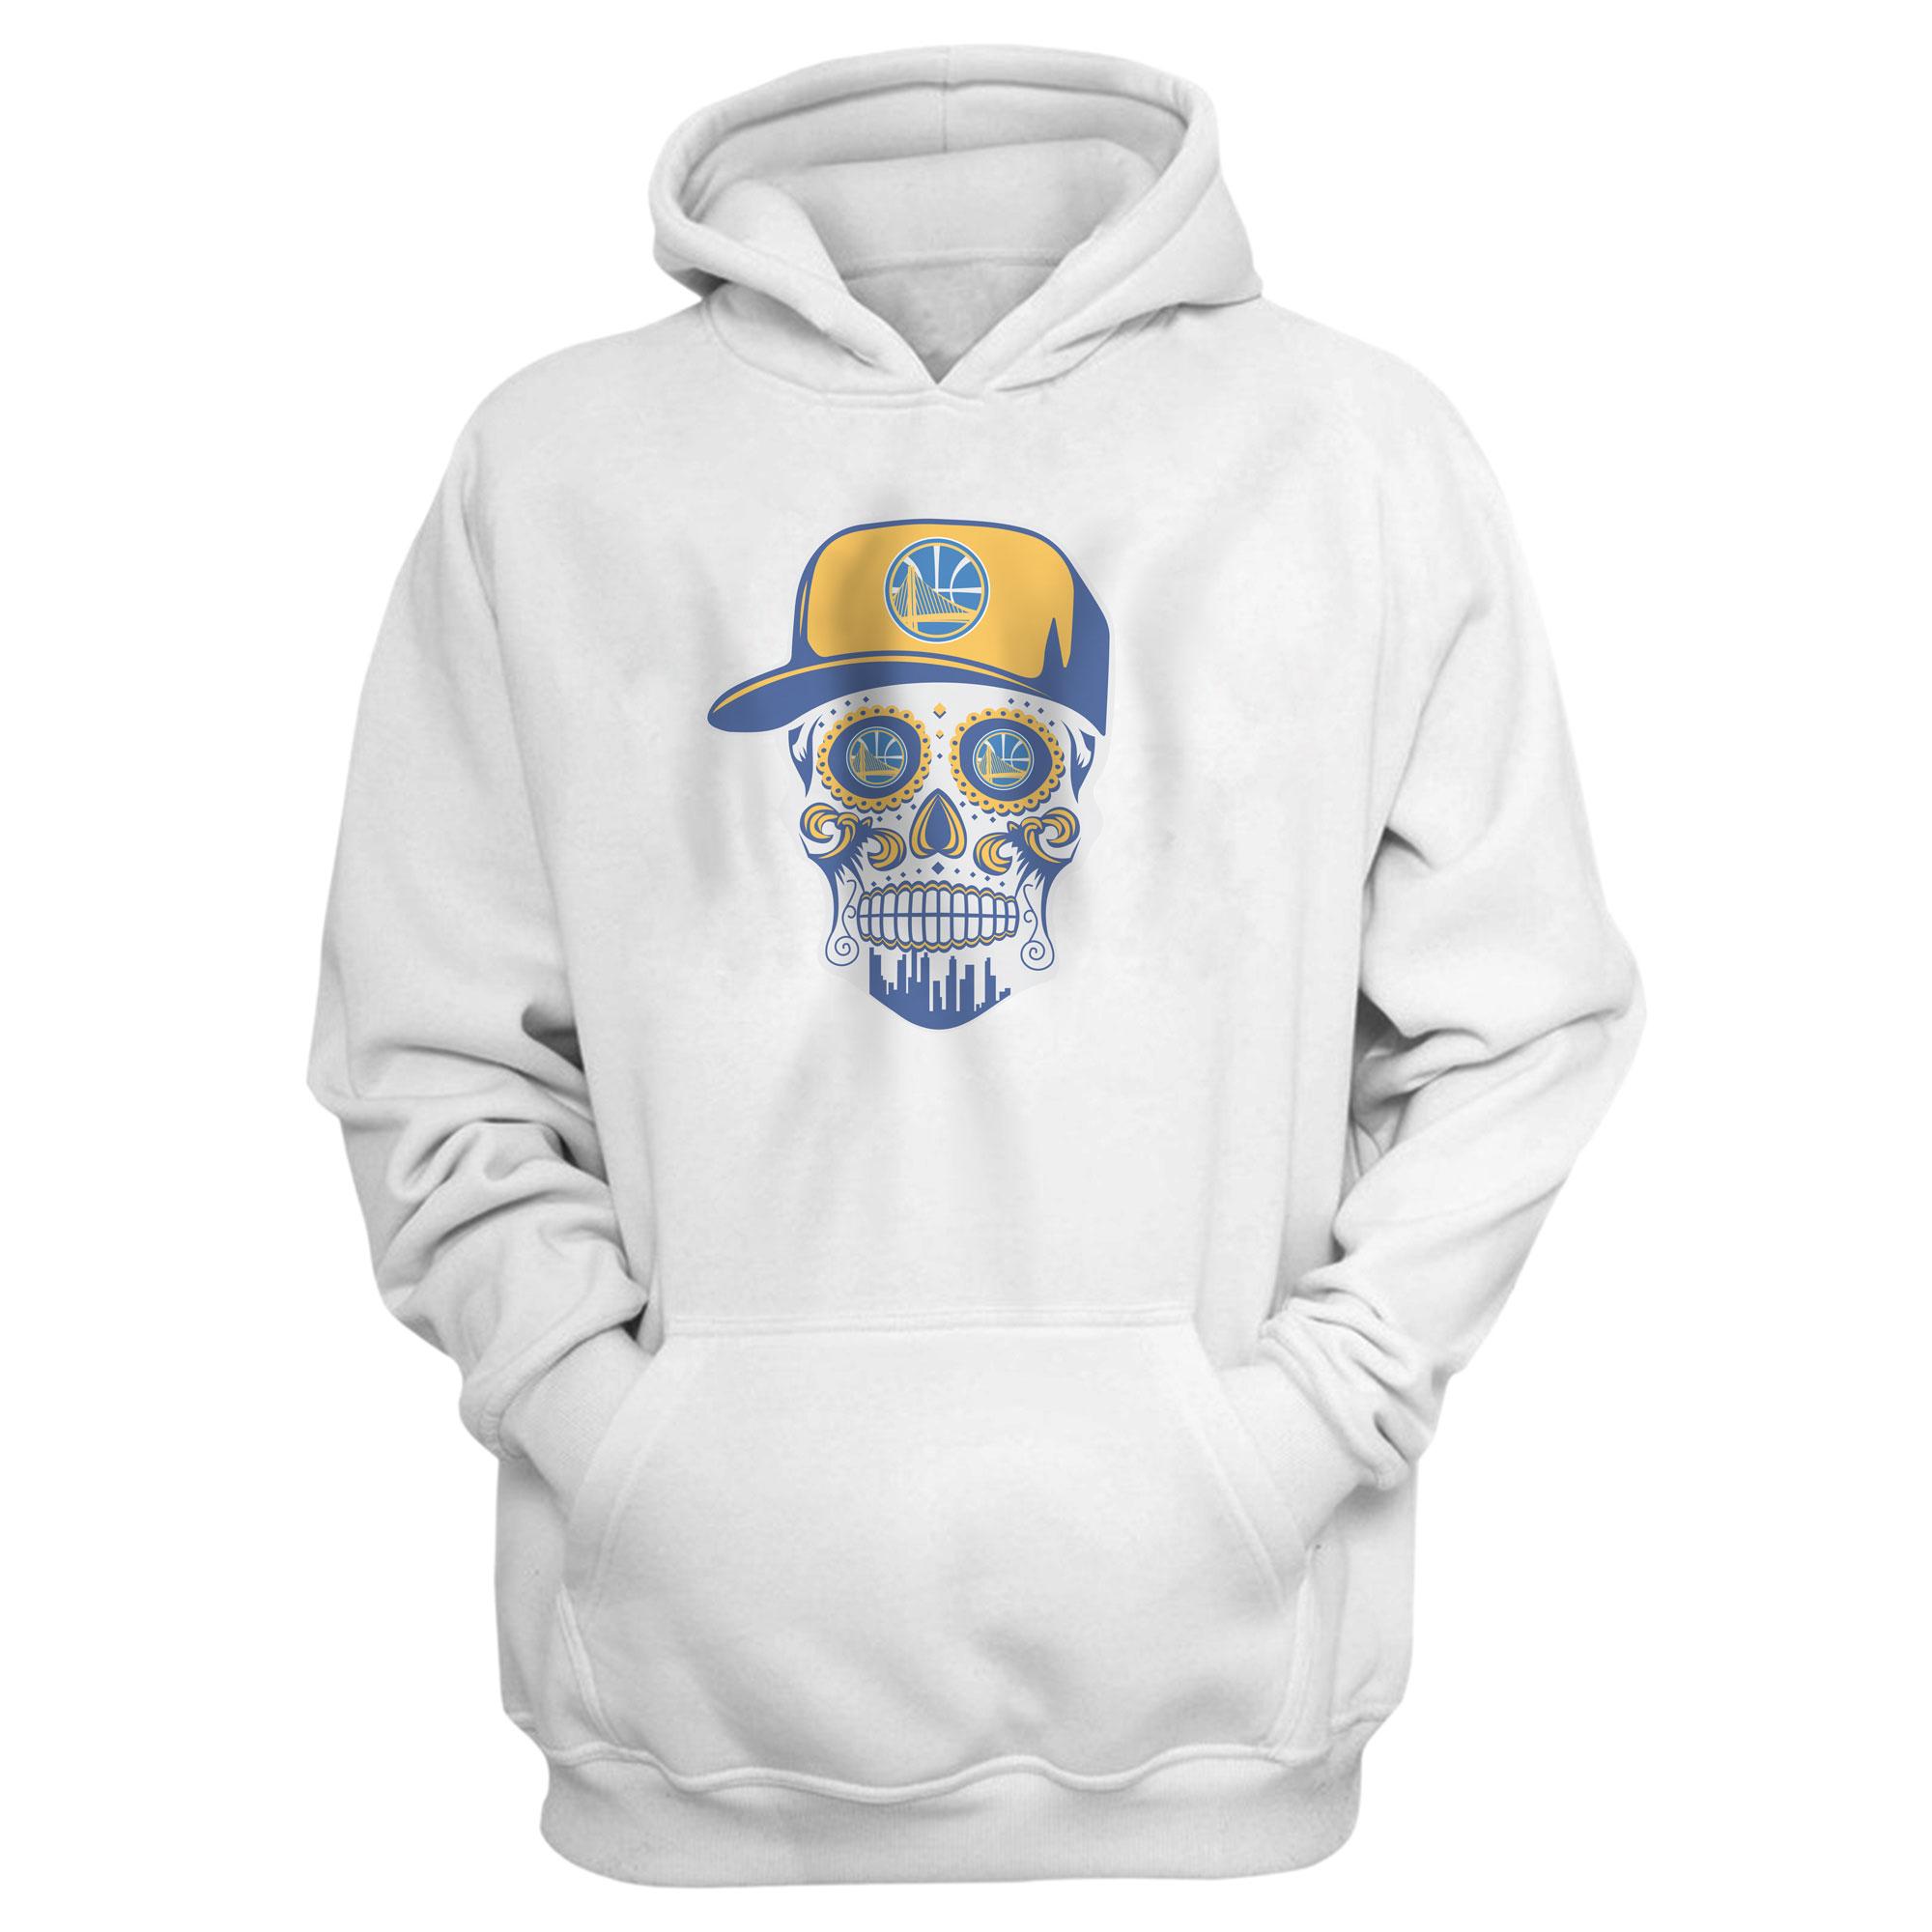 Warriors Skull Hoodie (HD-WHT-NP-452-NBA-GSW-SKULL)